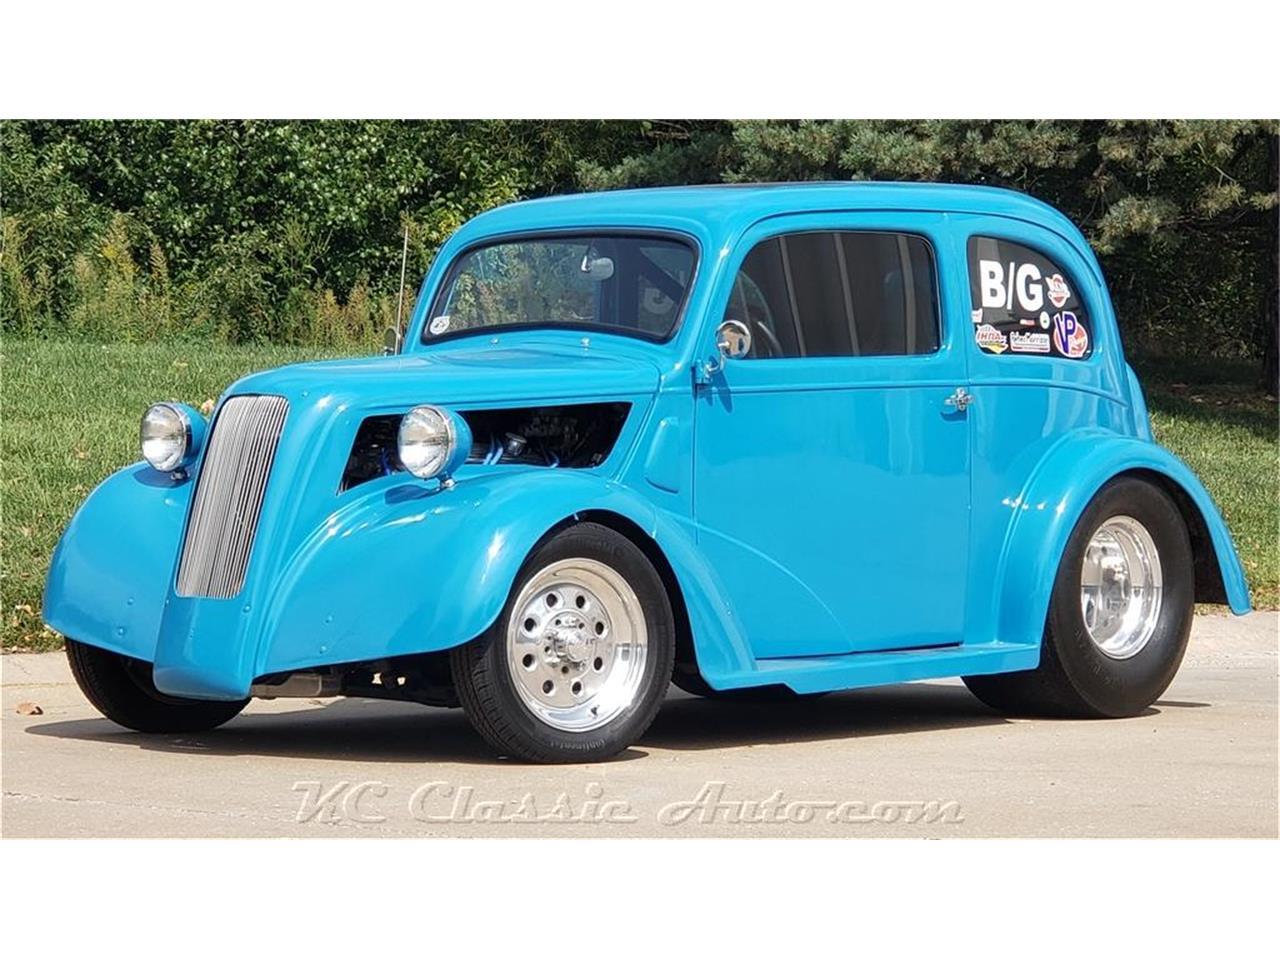 for sale 1948 ford anglia in lenexa, kansas cars - shawnee mission, ks at geebo